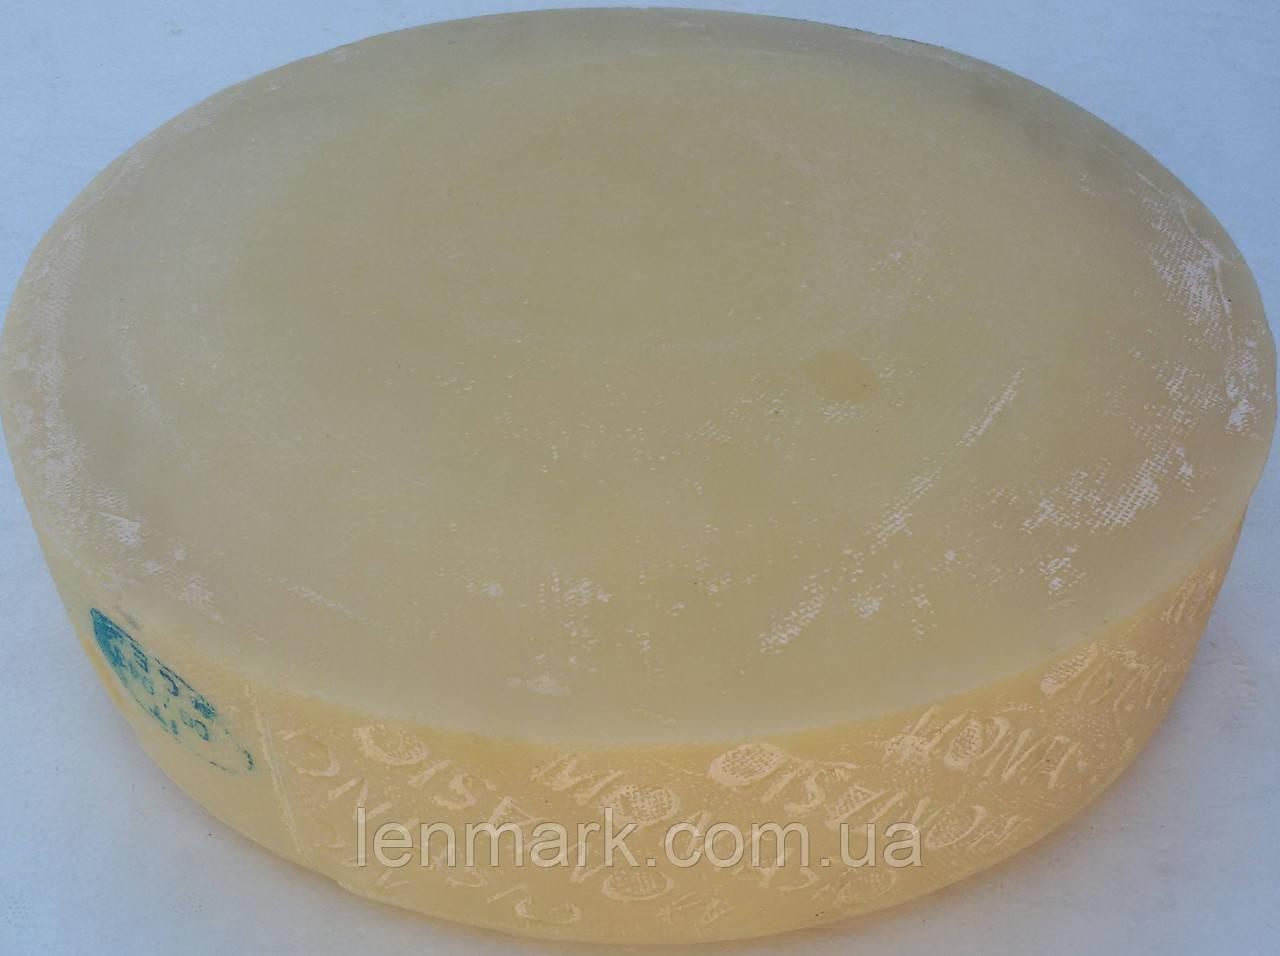 Сыр Formaggio Montasio stag DOP